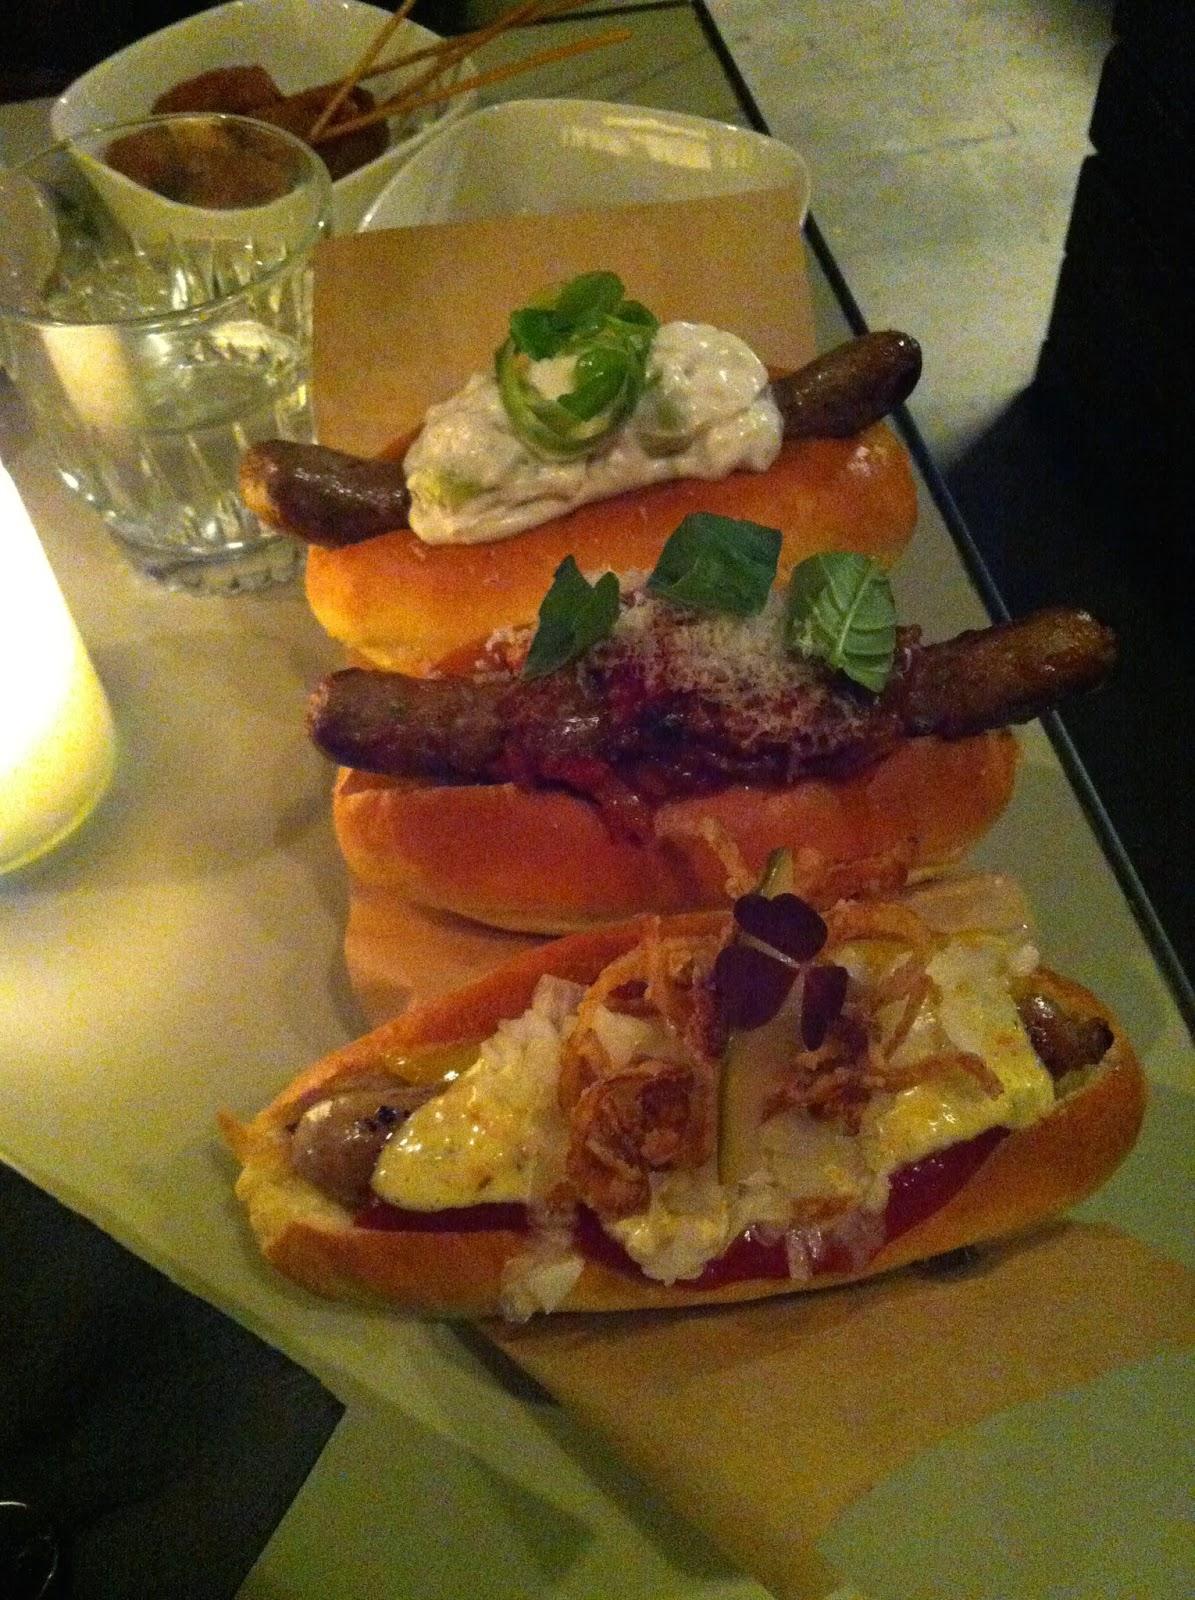 Special hotdogs in Copehagen